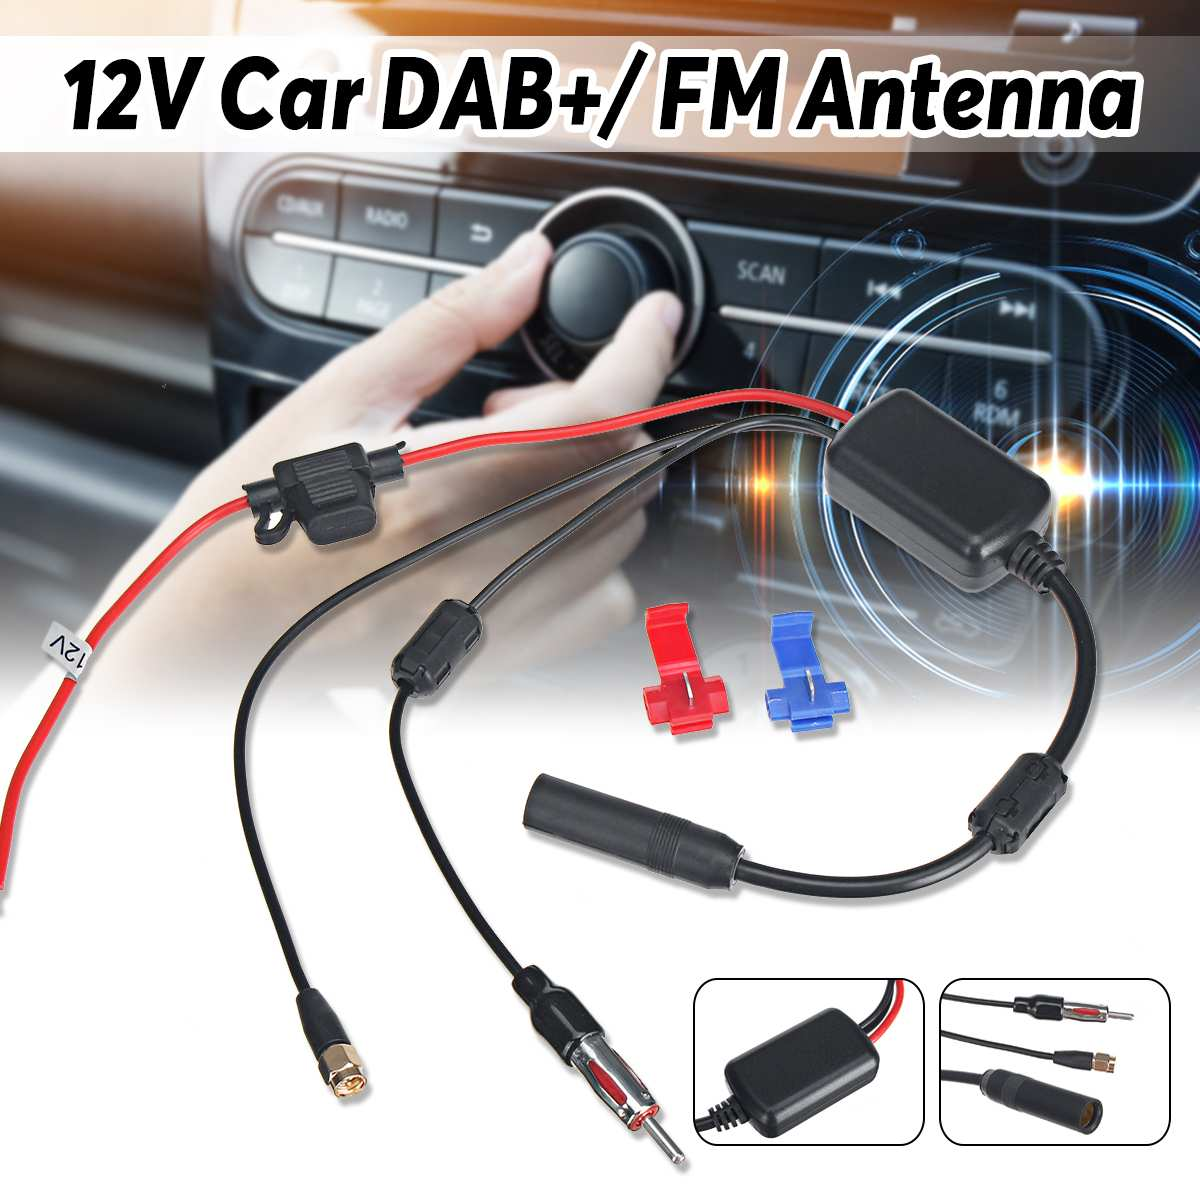 SAAB 9-3//9-5 Car Stereo Radio Fakra Booster Amplified Aerial Antenna Adaptor